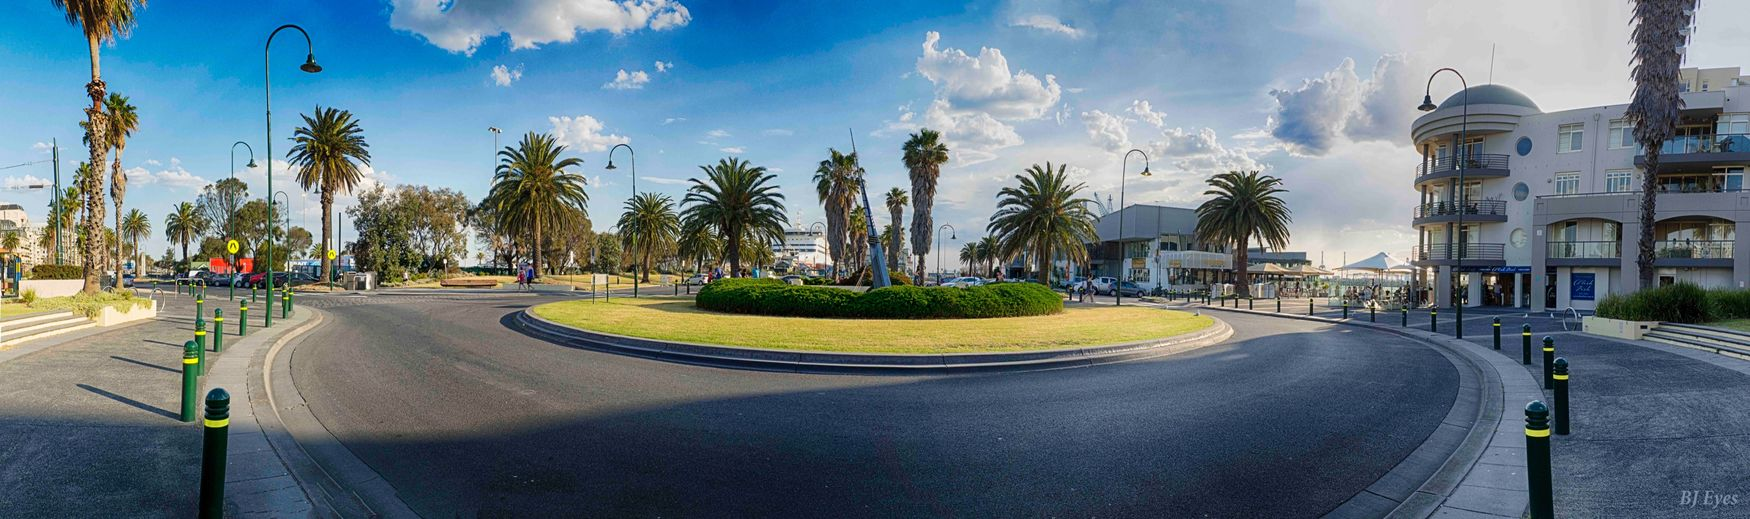 Port Melbourne Tree Road Plant Transportation Cloud - Sky